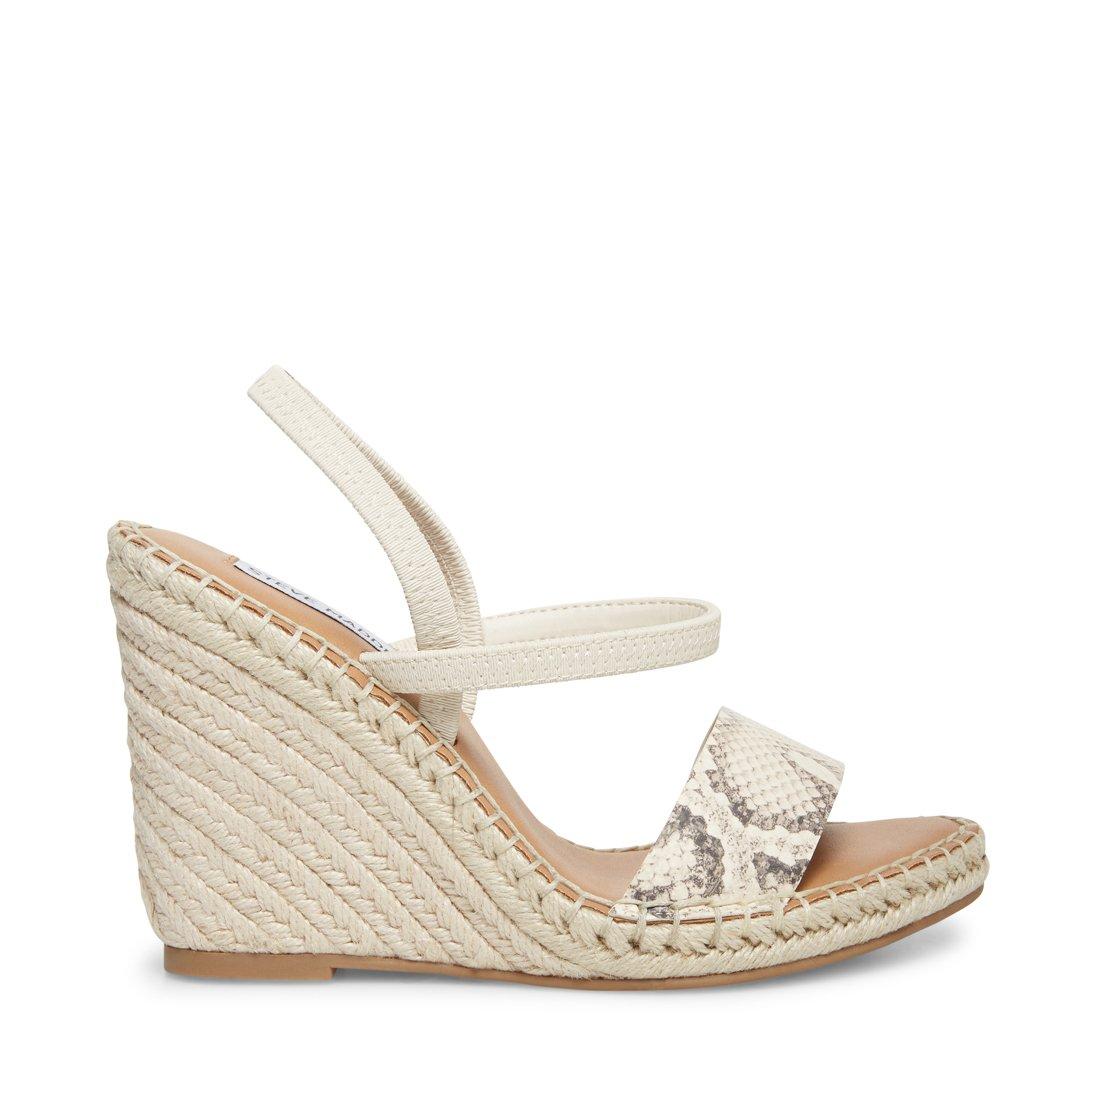 Steve Madden Women/'s Mckenzie Espadrille Wedge Sandals BONE SNAKE